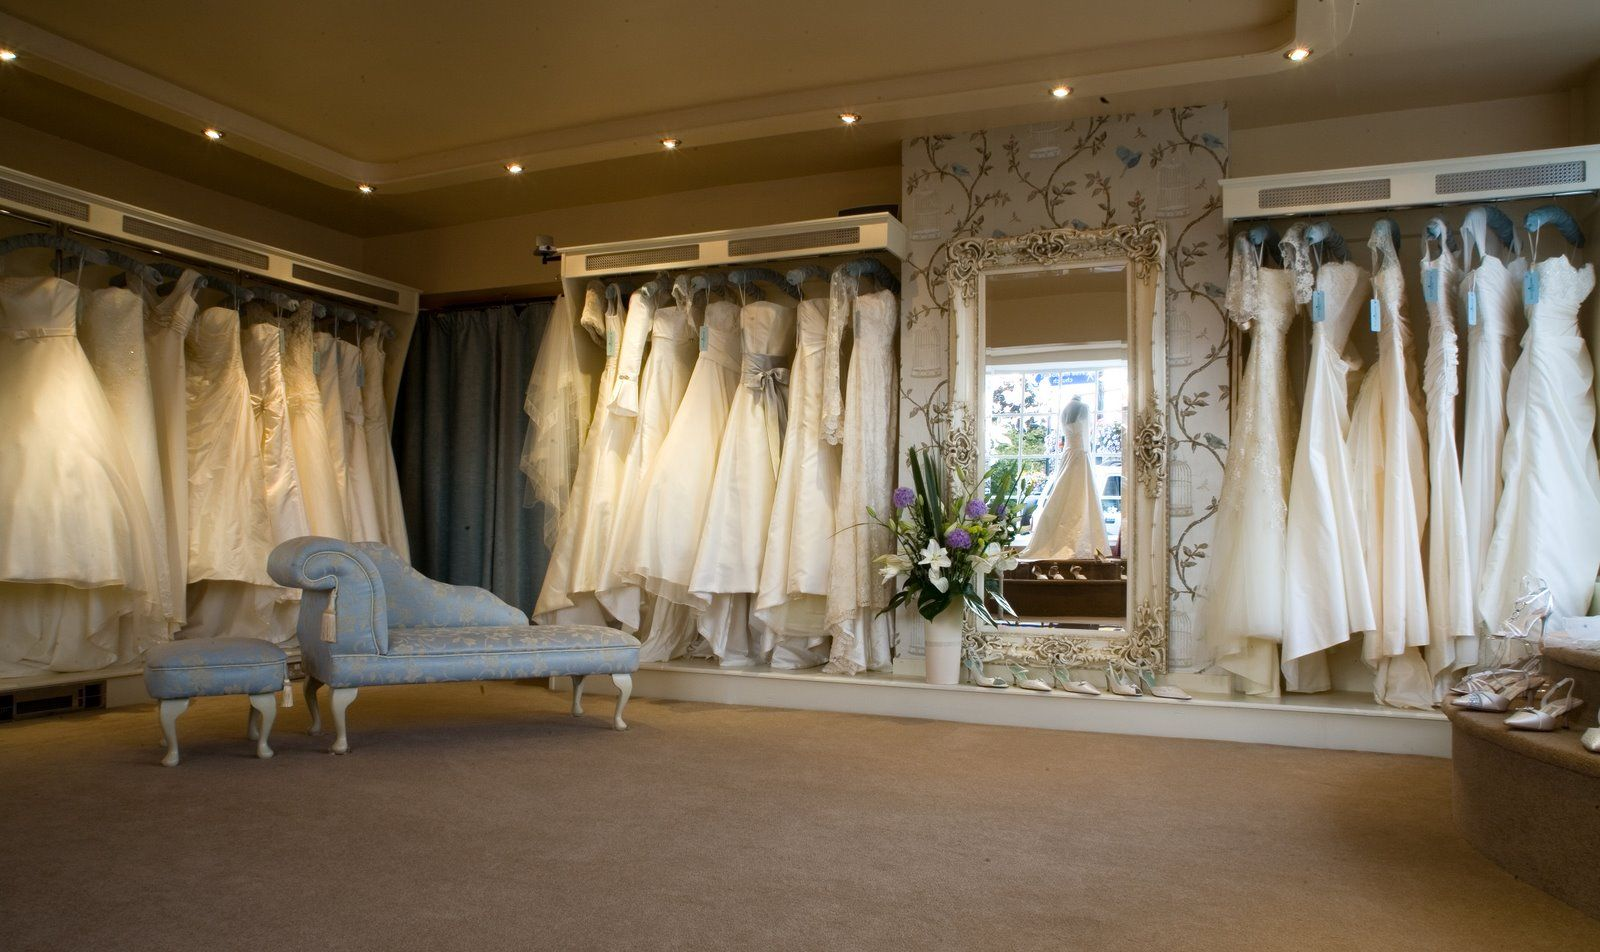 ebd0f405325 Ellie Sanderson Bridal Boutique | Retail | Bridal shop interior ...